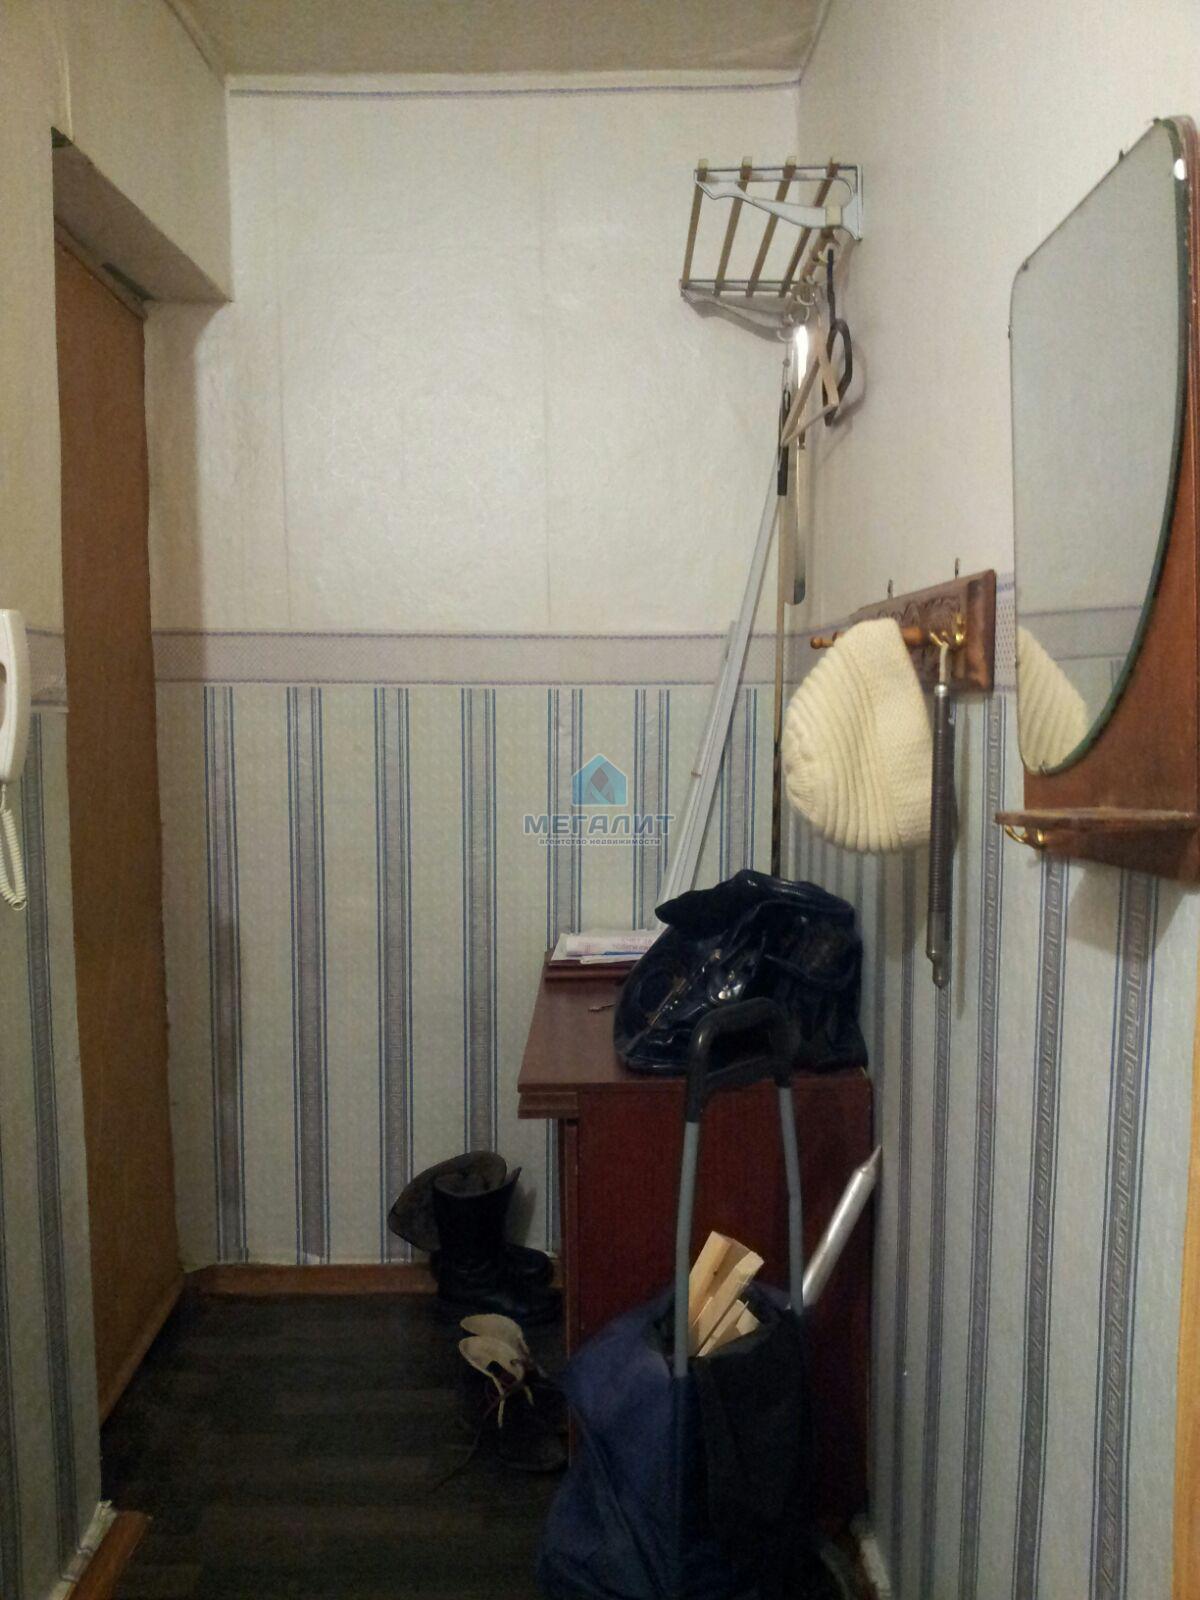 Аренда 2-к квартиры Краснооктябрьская 17, 45.0 м² (миниатюра №8)